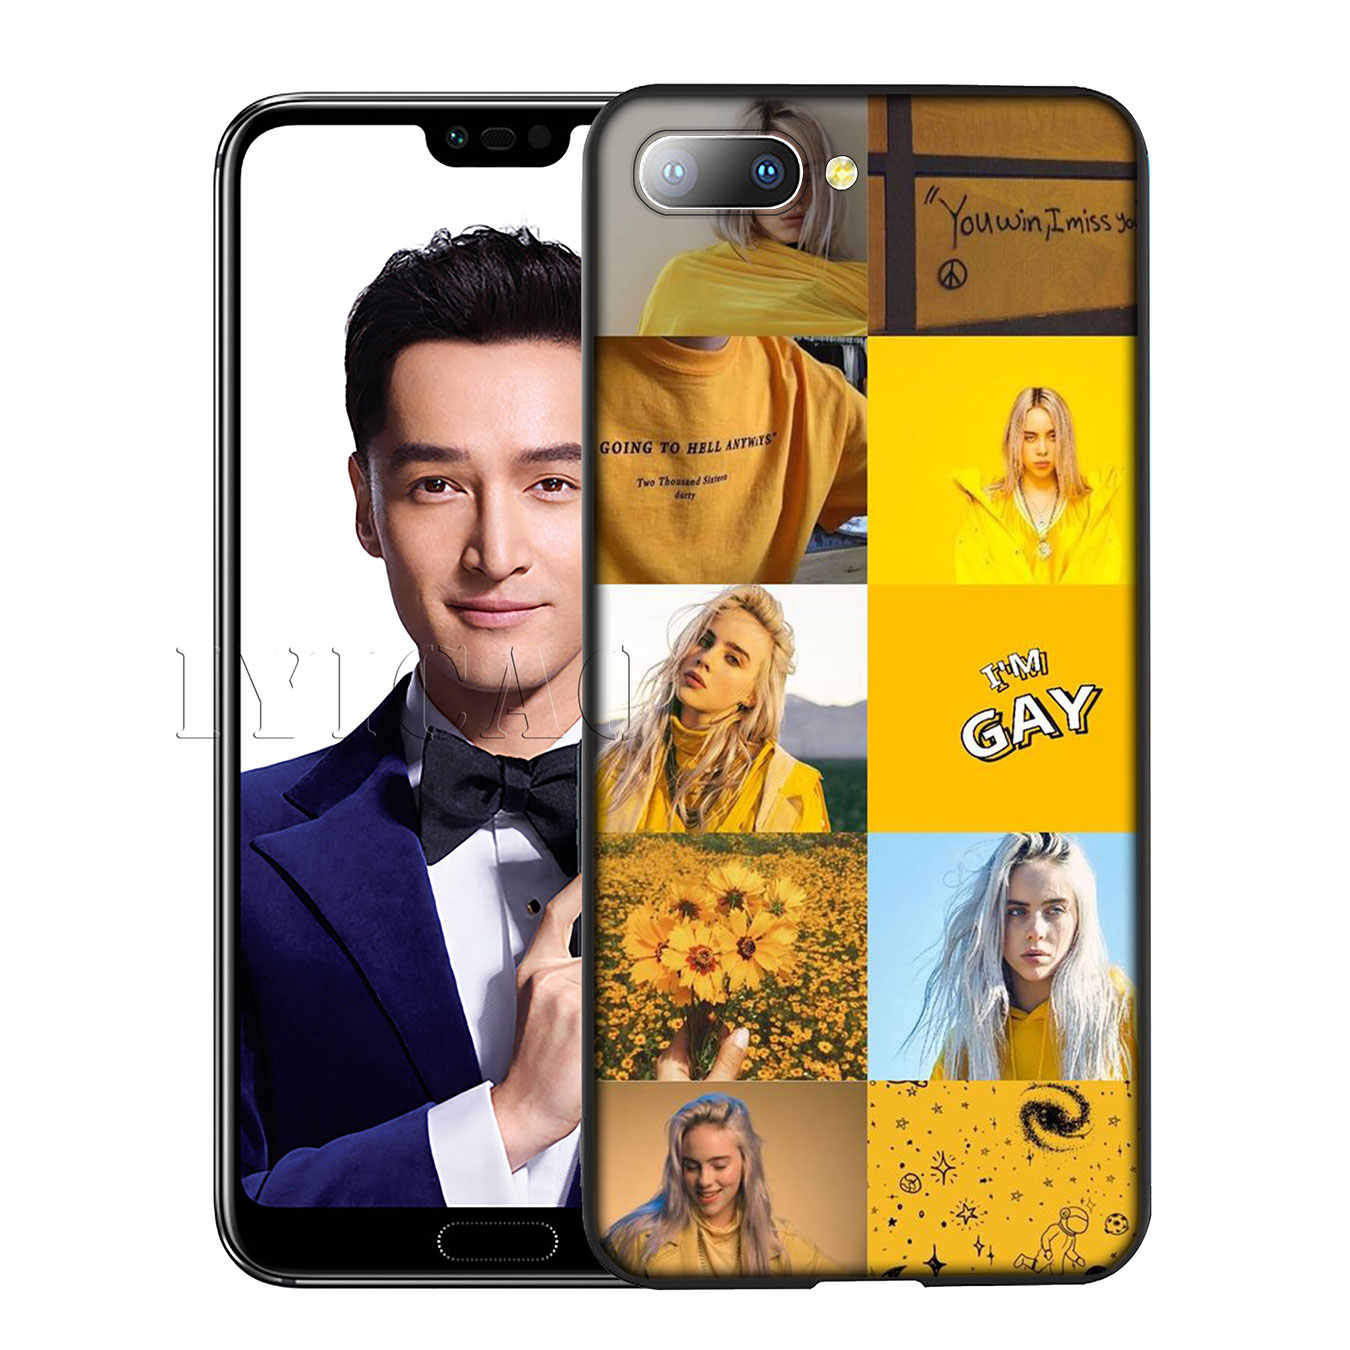 IYICAO Billie Eilish Khalid Lovely Silicone Soft Case for Huawei Y7 Y6 Prime Y9 2018 Honor 8C 8X 8 9 10 Lite 6A 7C 7X 7A Pro